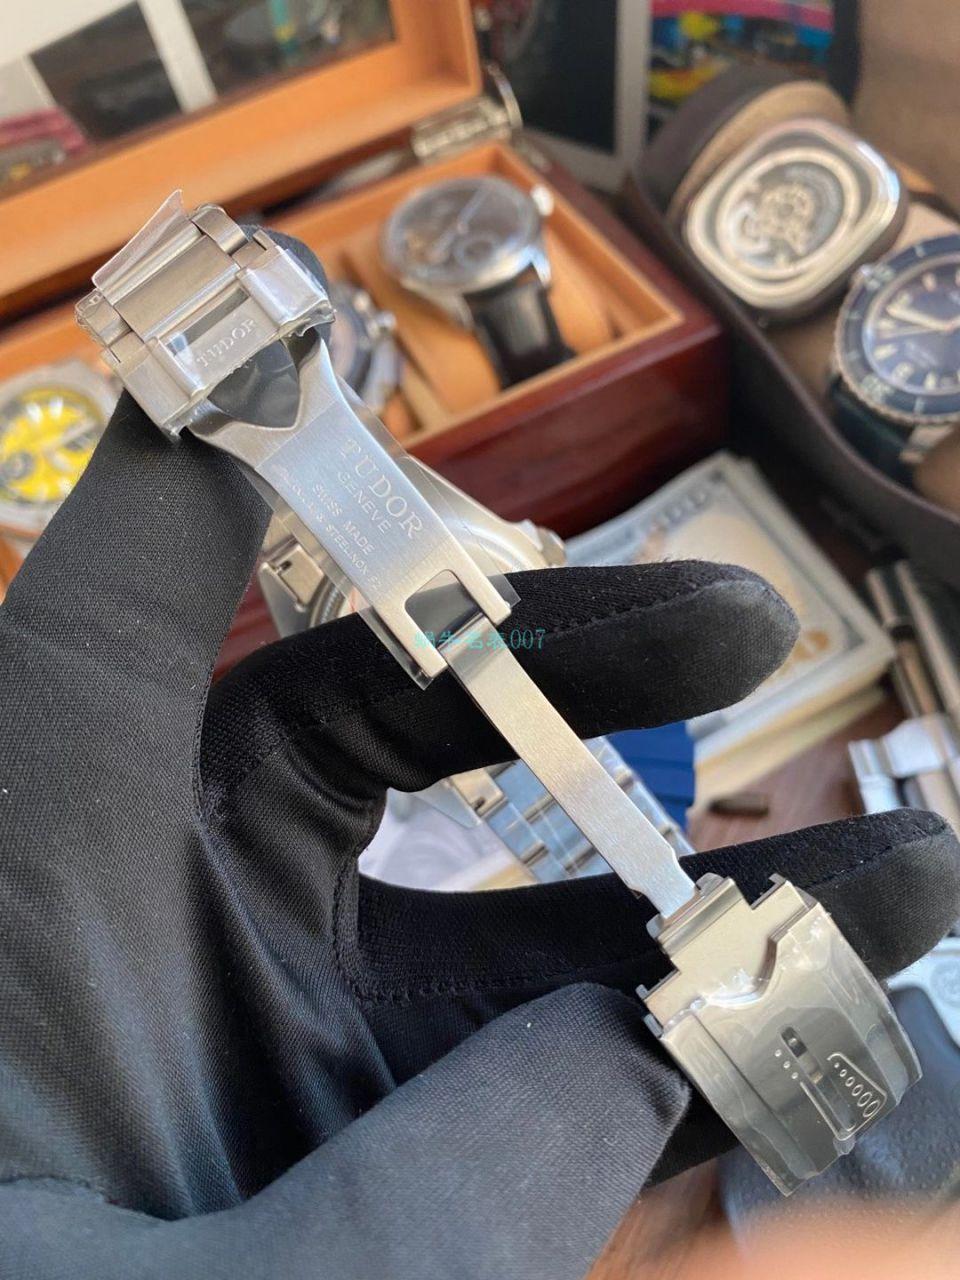 XF厂帝舵蓝色战斧一比一超A高仿手表PELAGOS系列25600TB腕表 / DT076